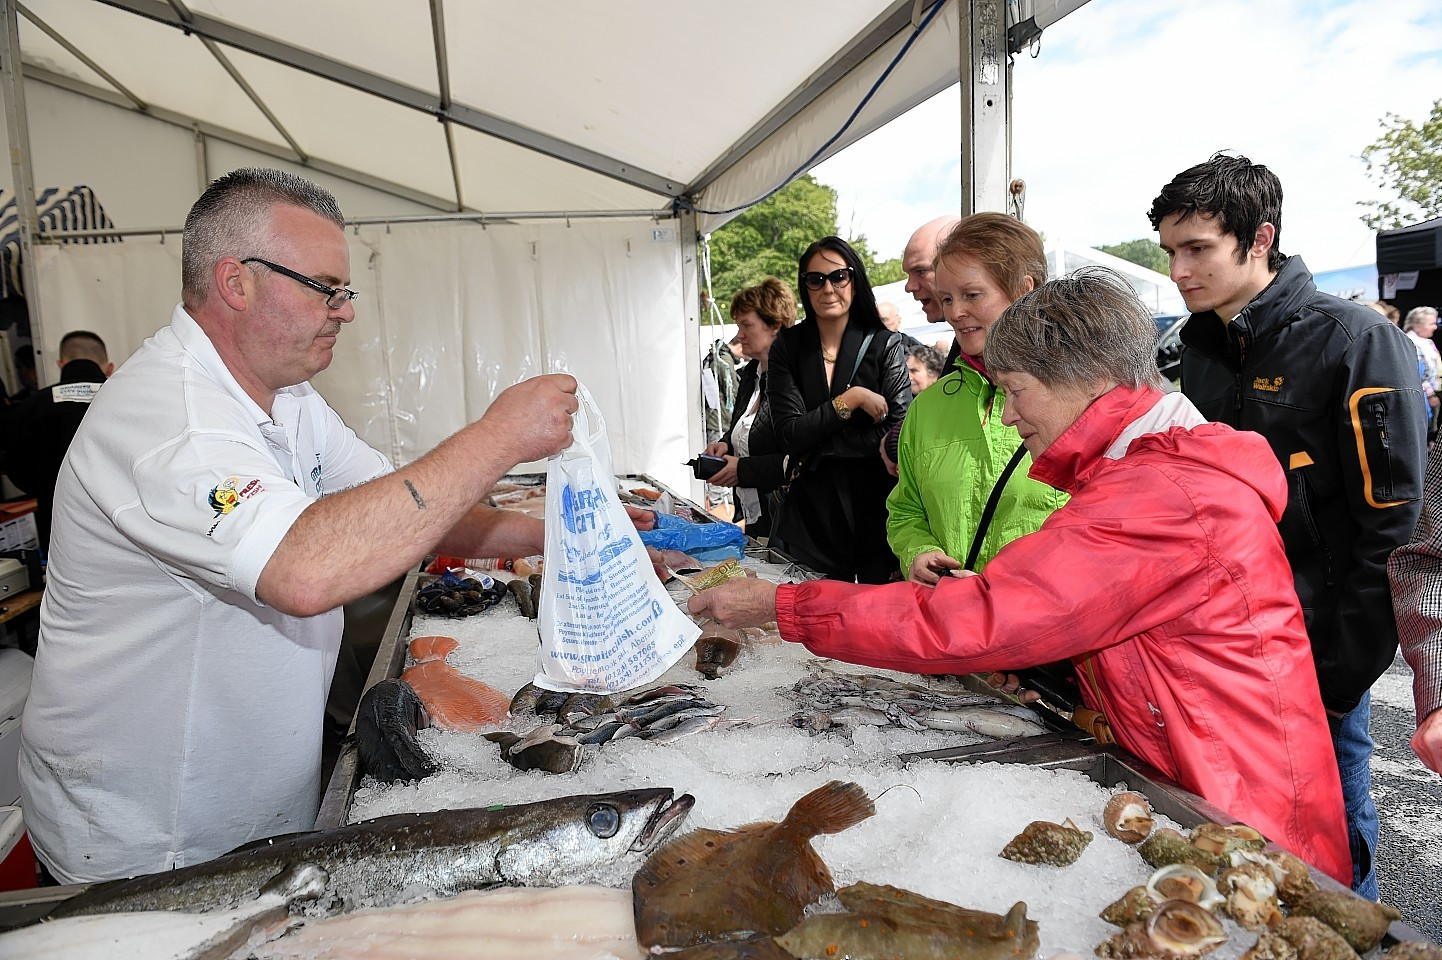 Taste of Grampian food and drink festival 2015 held at Thainstone, Aberdeenshire.